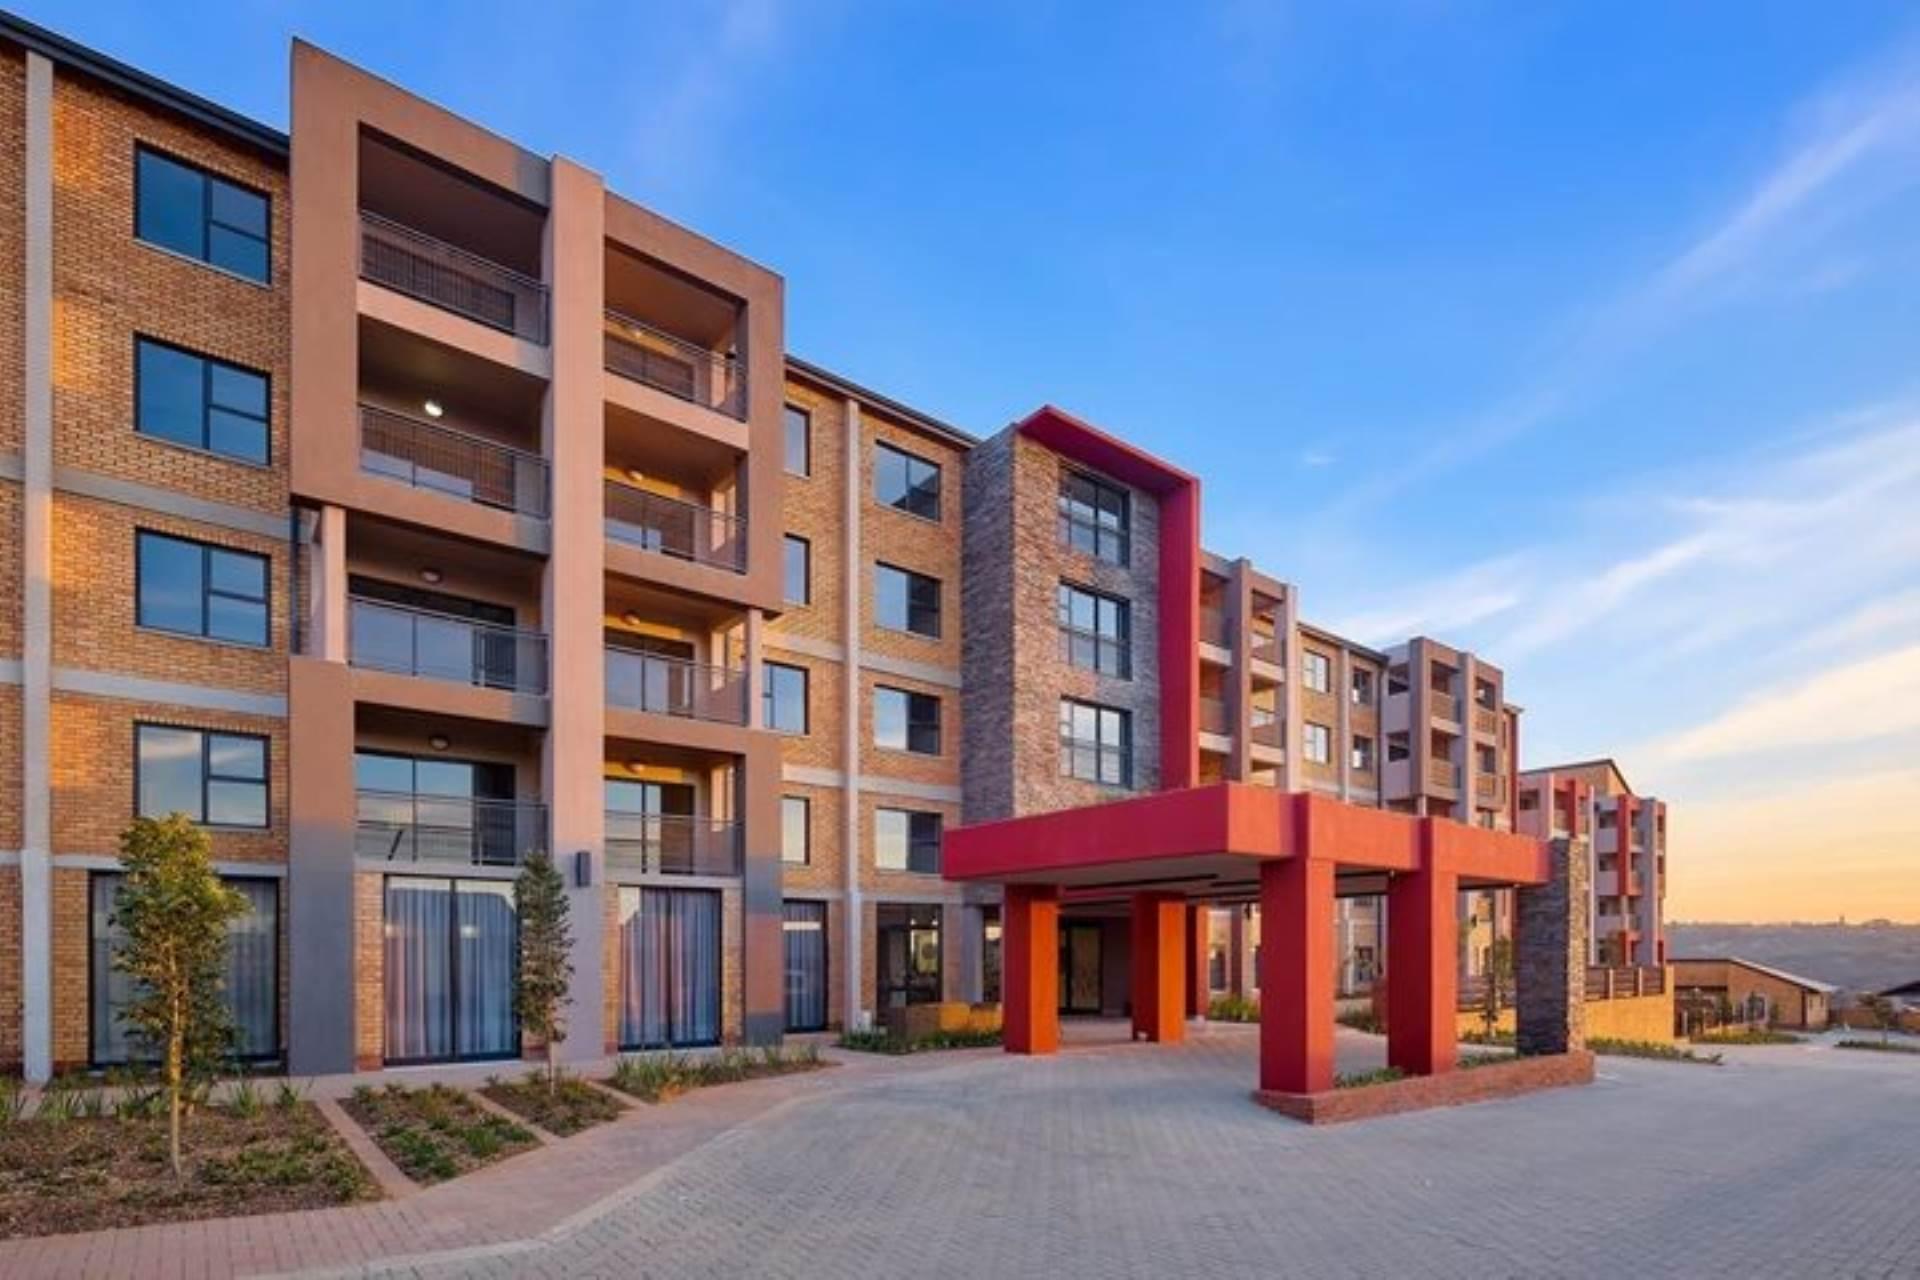 Retirement Village To Rent In North Riding A H, Randburg